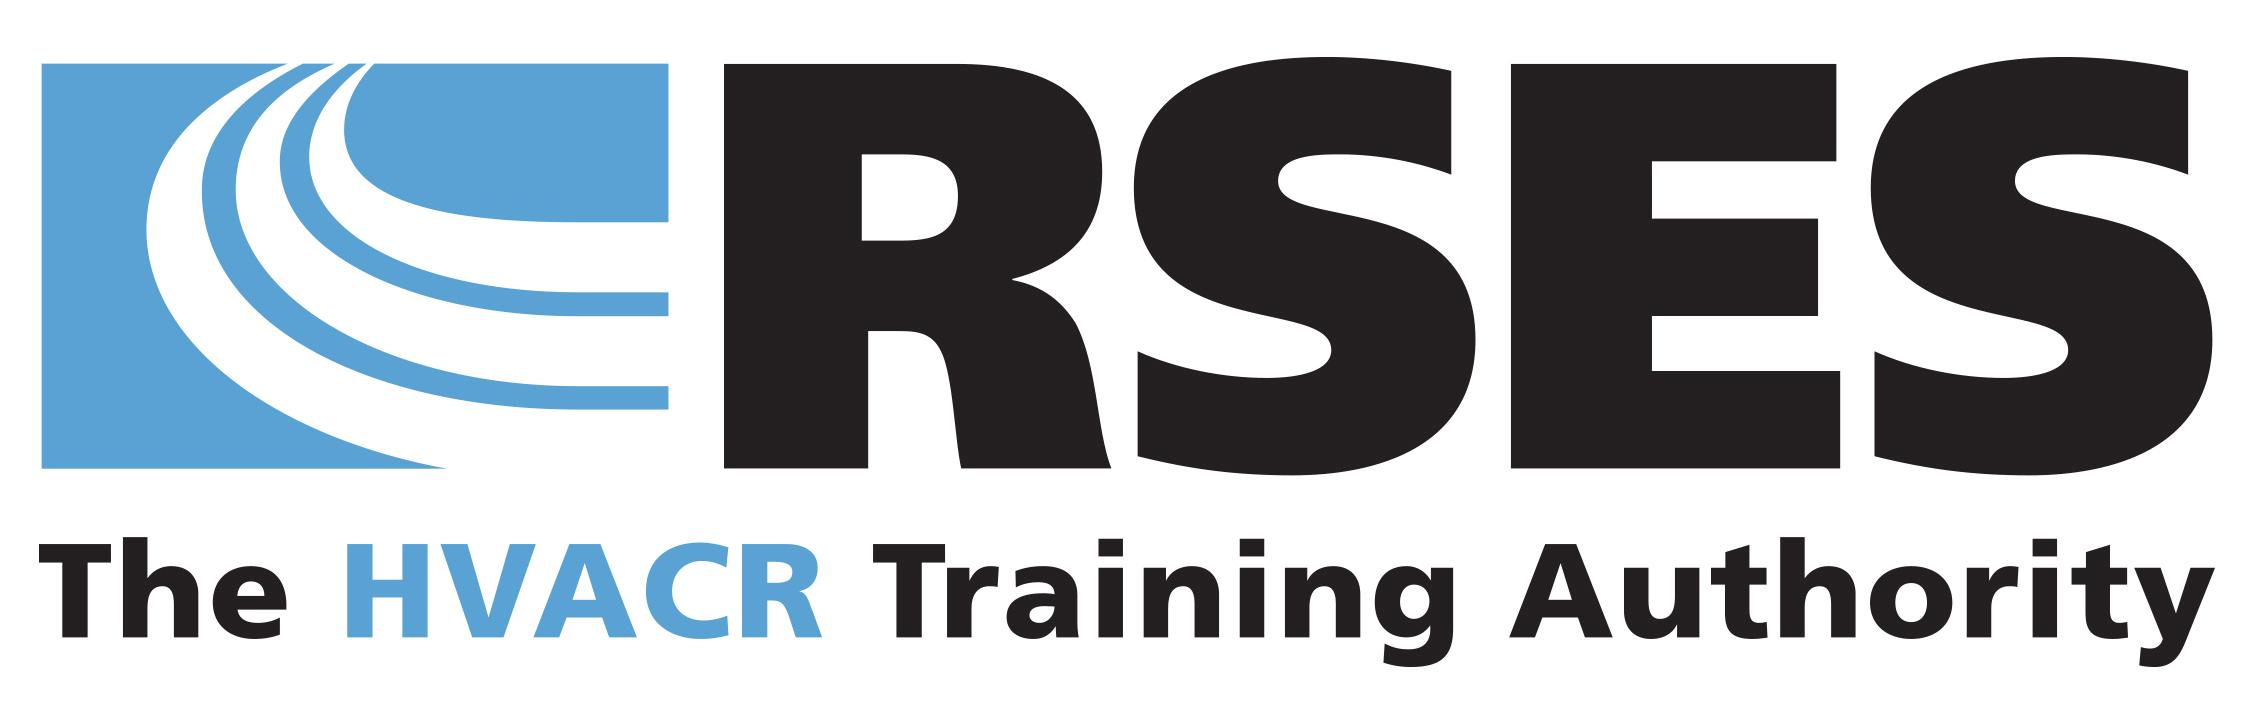 RSES Logo.jpg